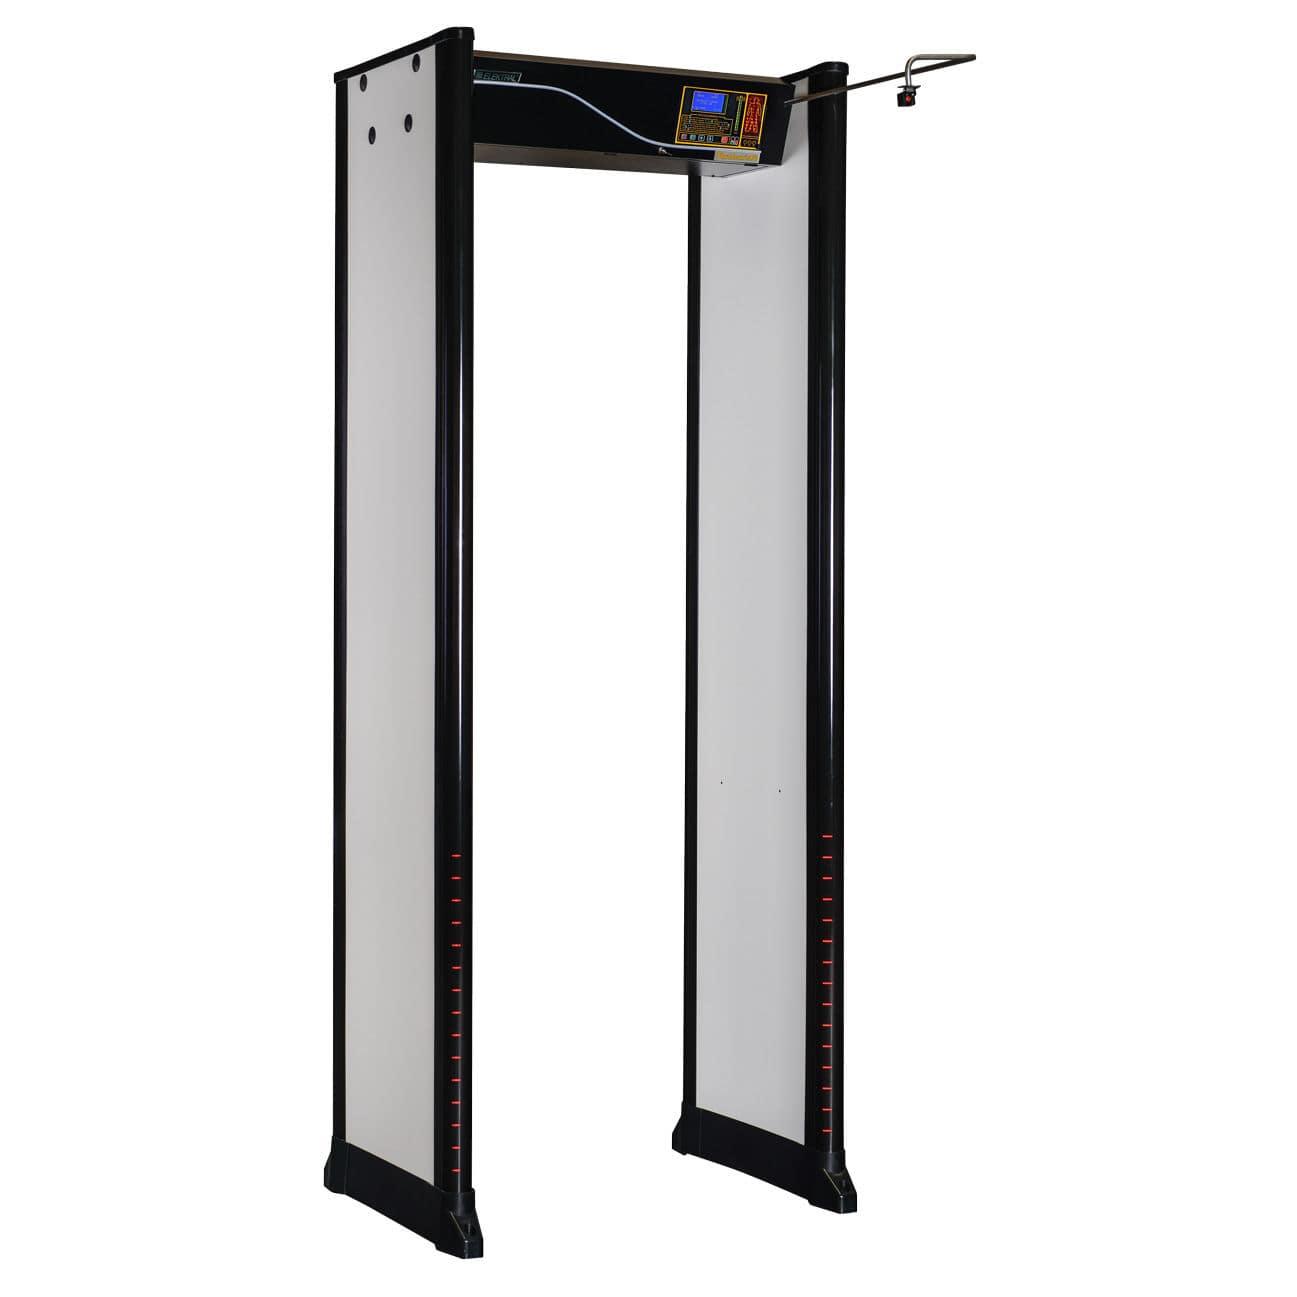 Airport walk-through detector - ThruScan® s27-i - Elektral - ThruScan Metal Detectors